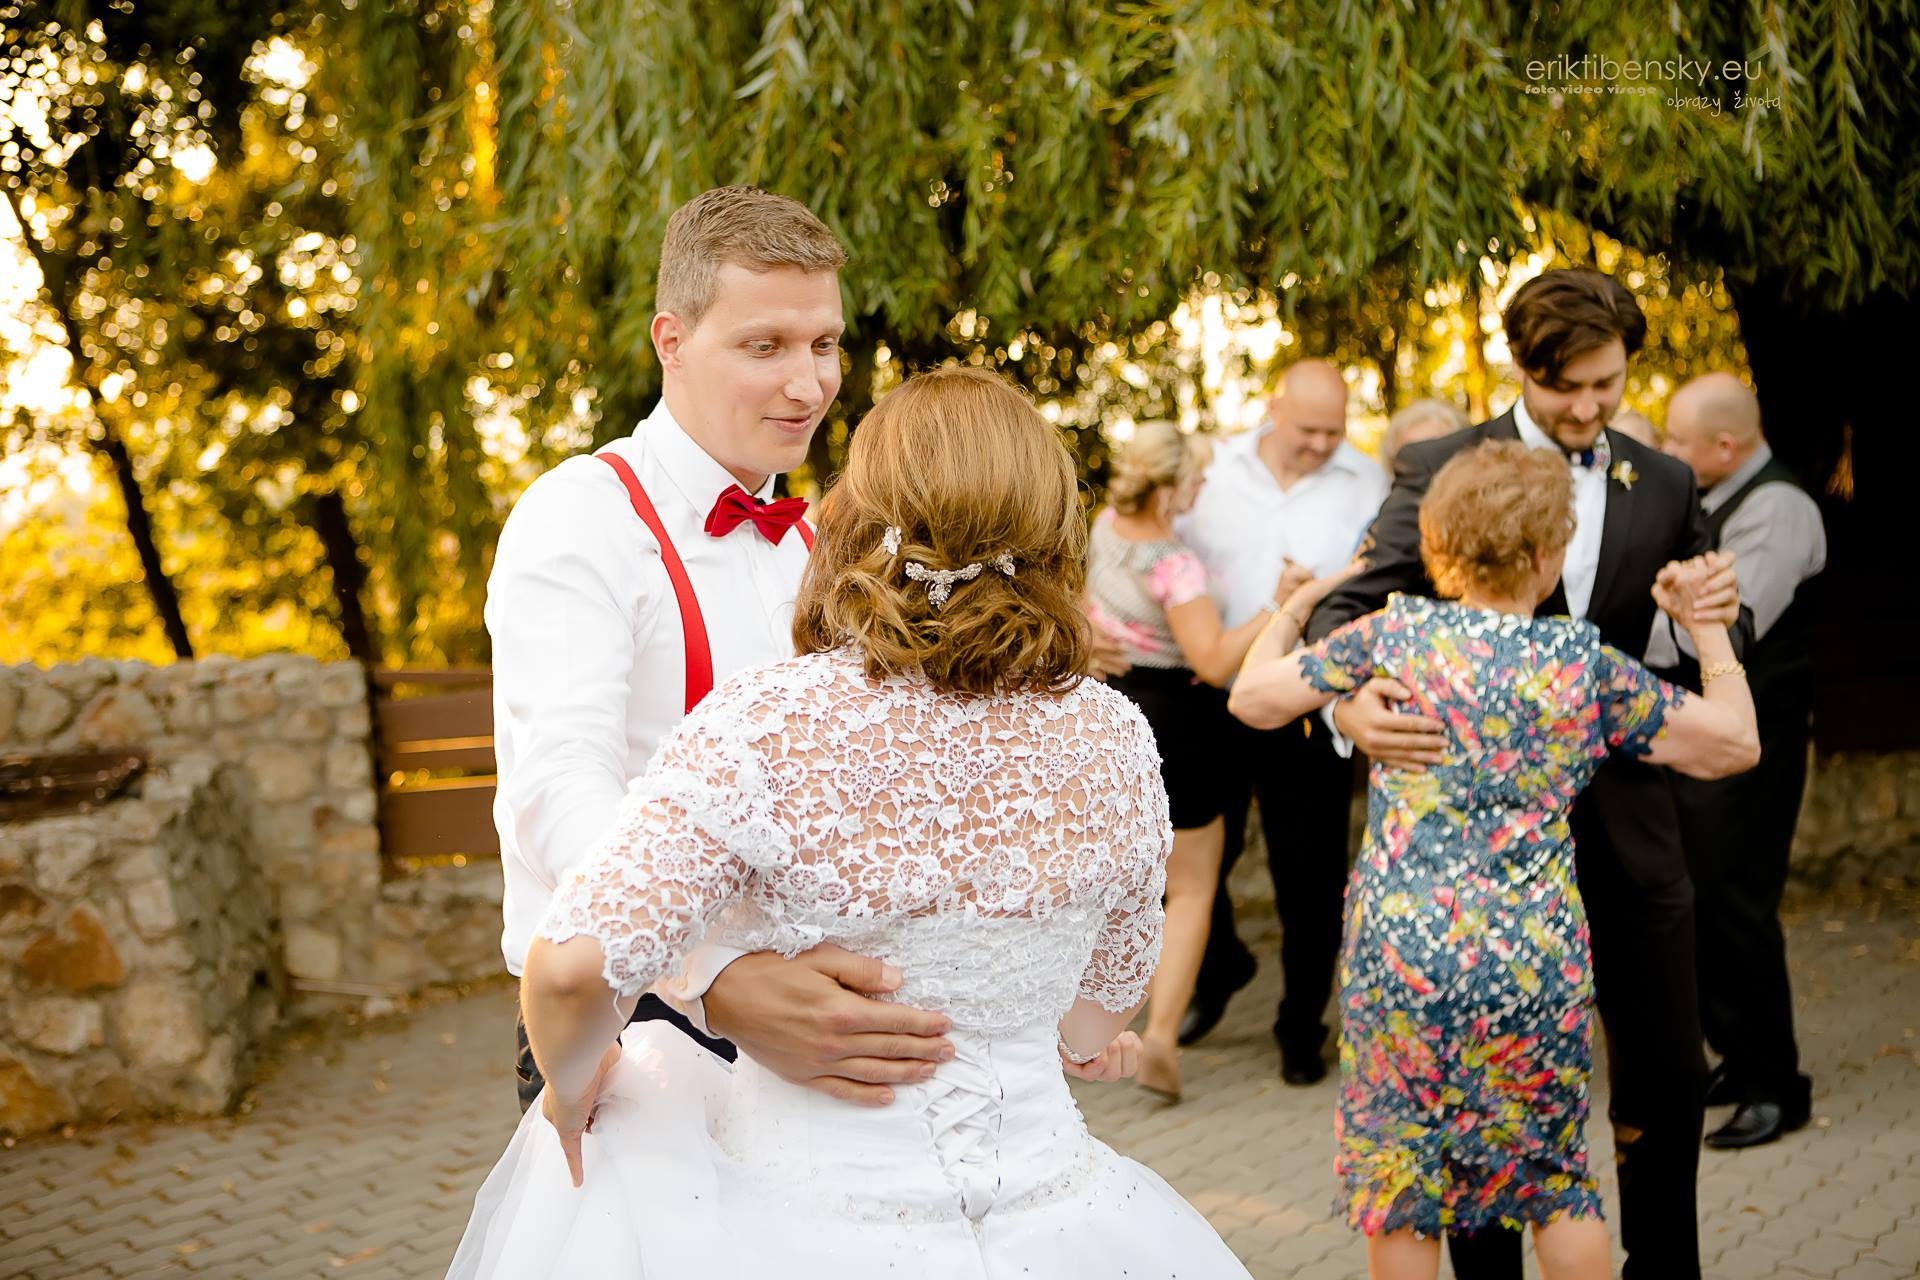 eriktibensky-eu-svadobny-fotograf-wedding-photographer-3047